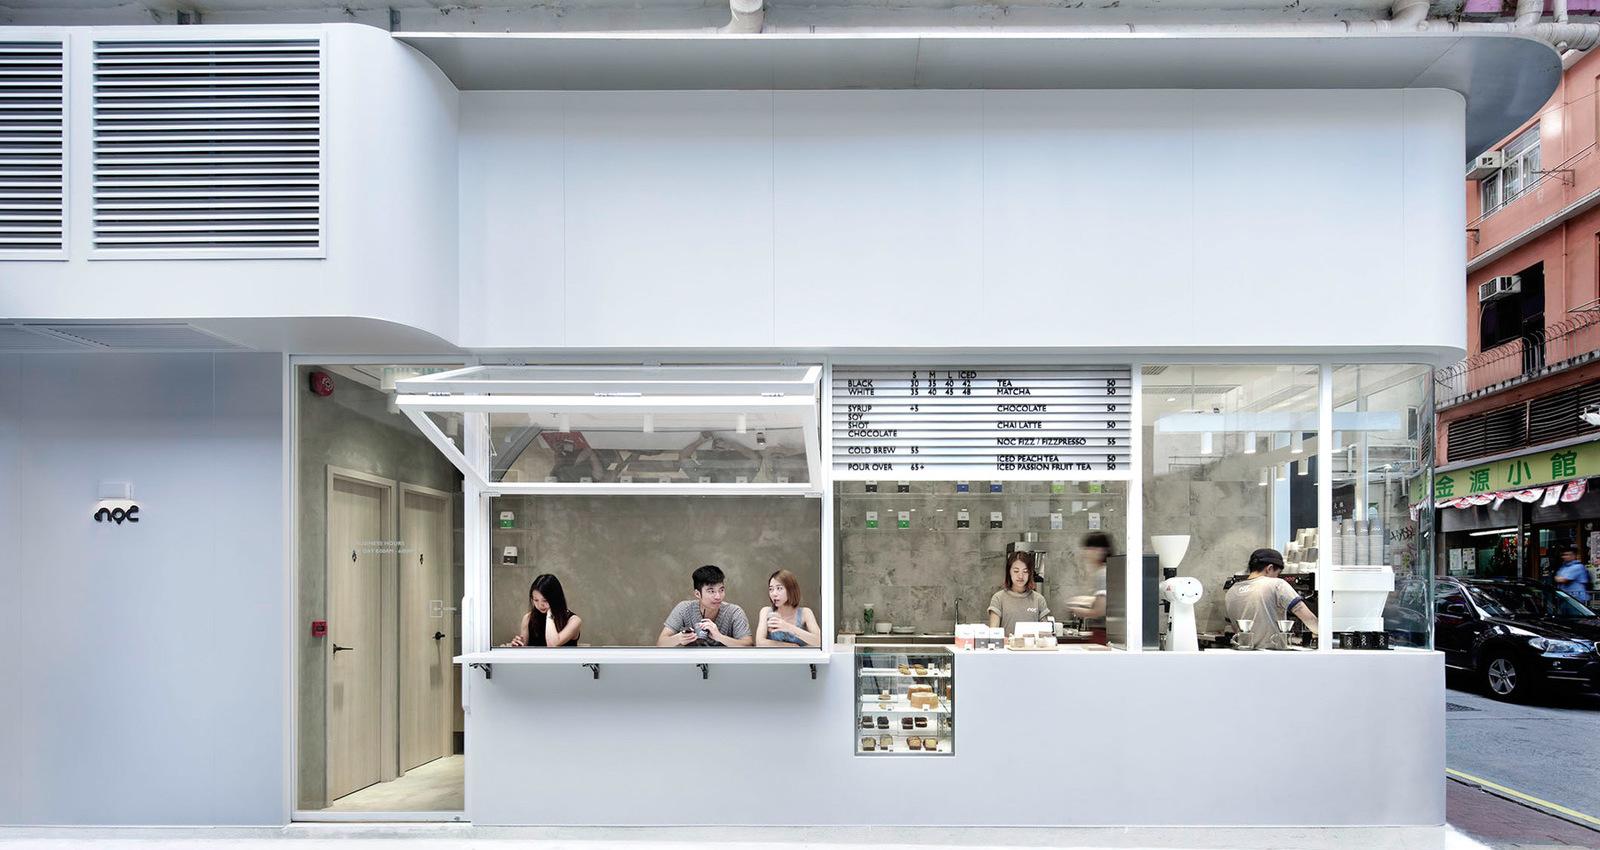 Noc Coffee Company